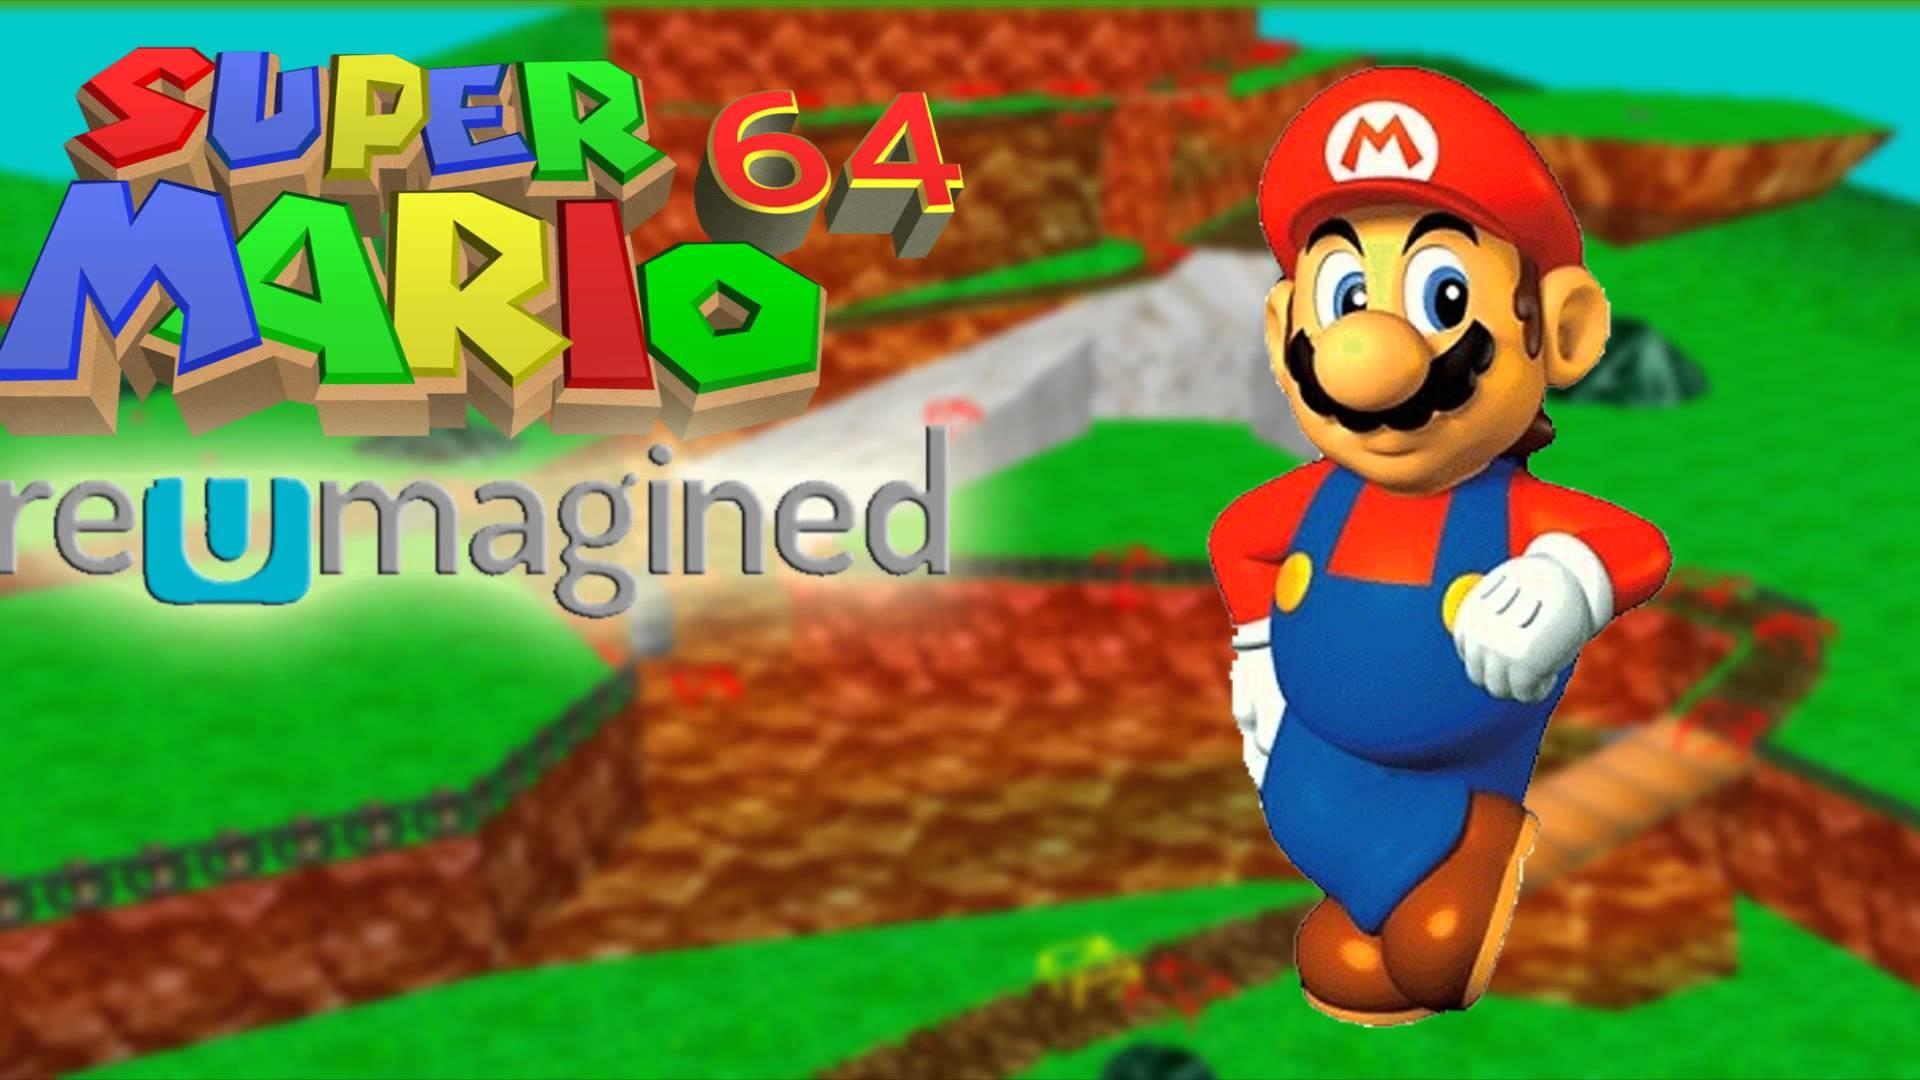 Mario 64 Reumagined – Slide (Fanmade)